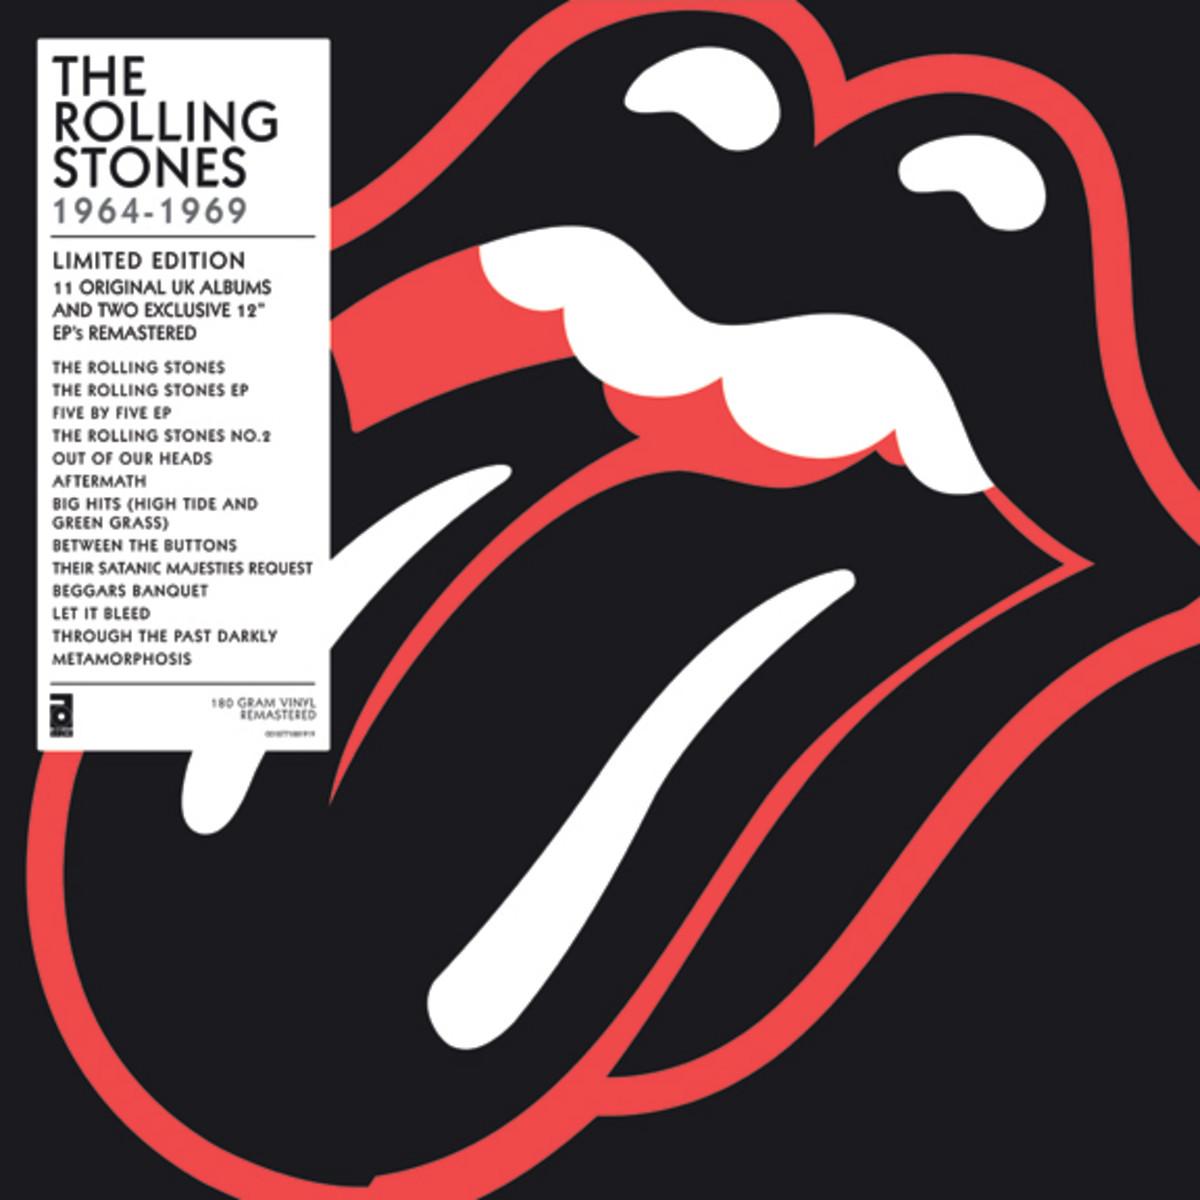 Rolling Stones box set on vinyl